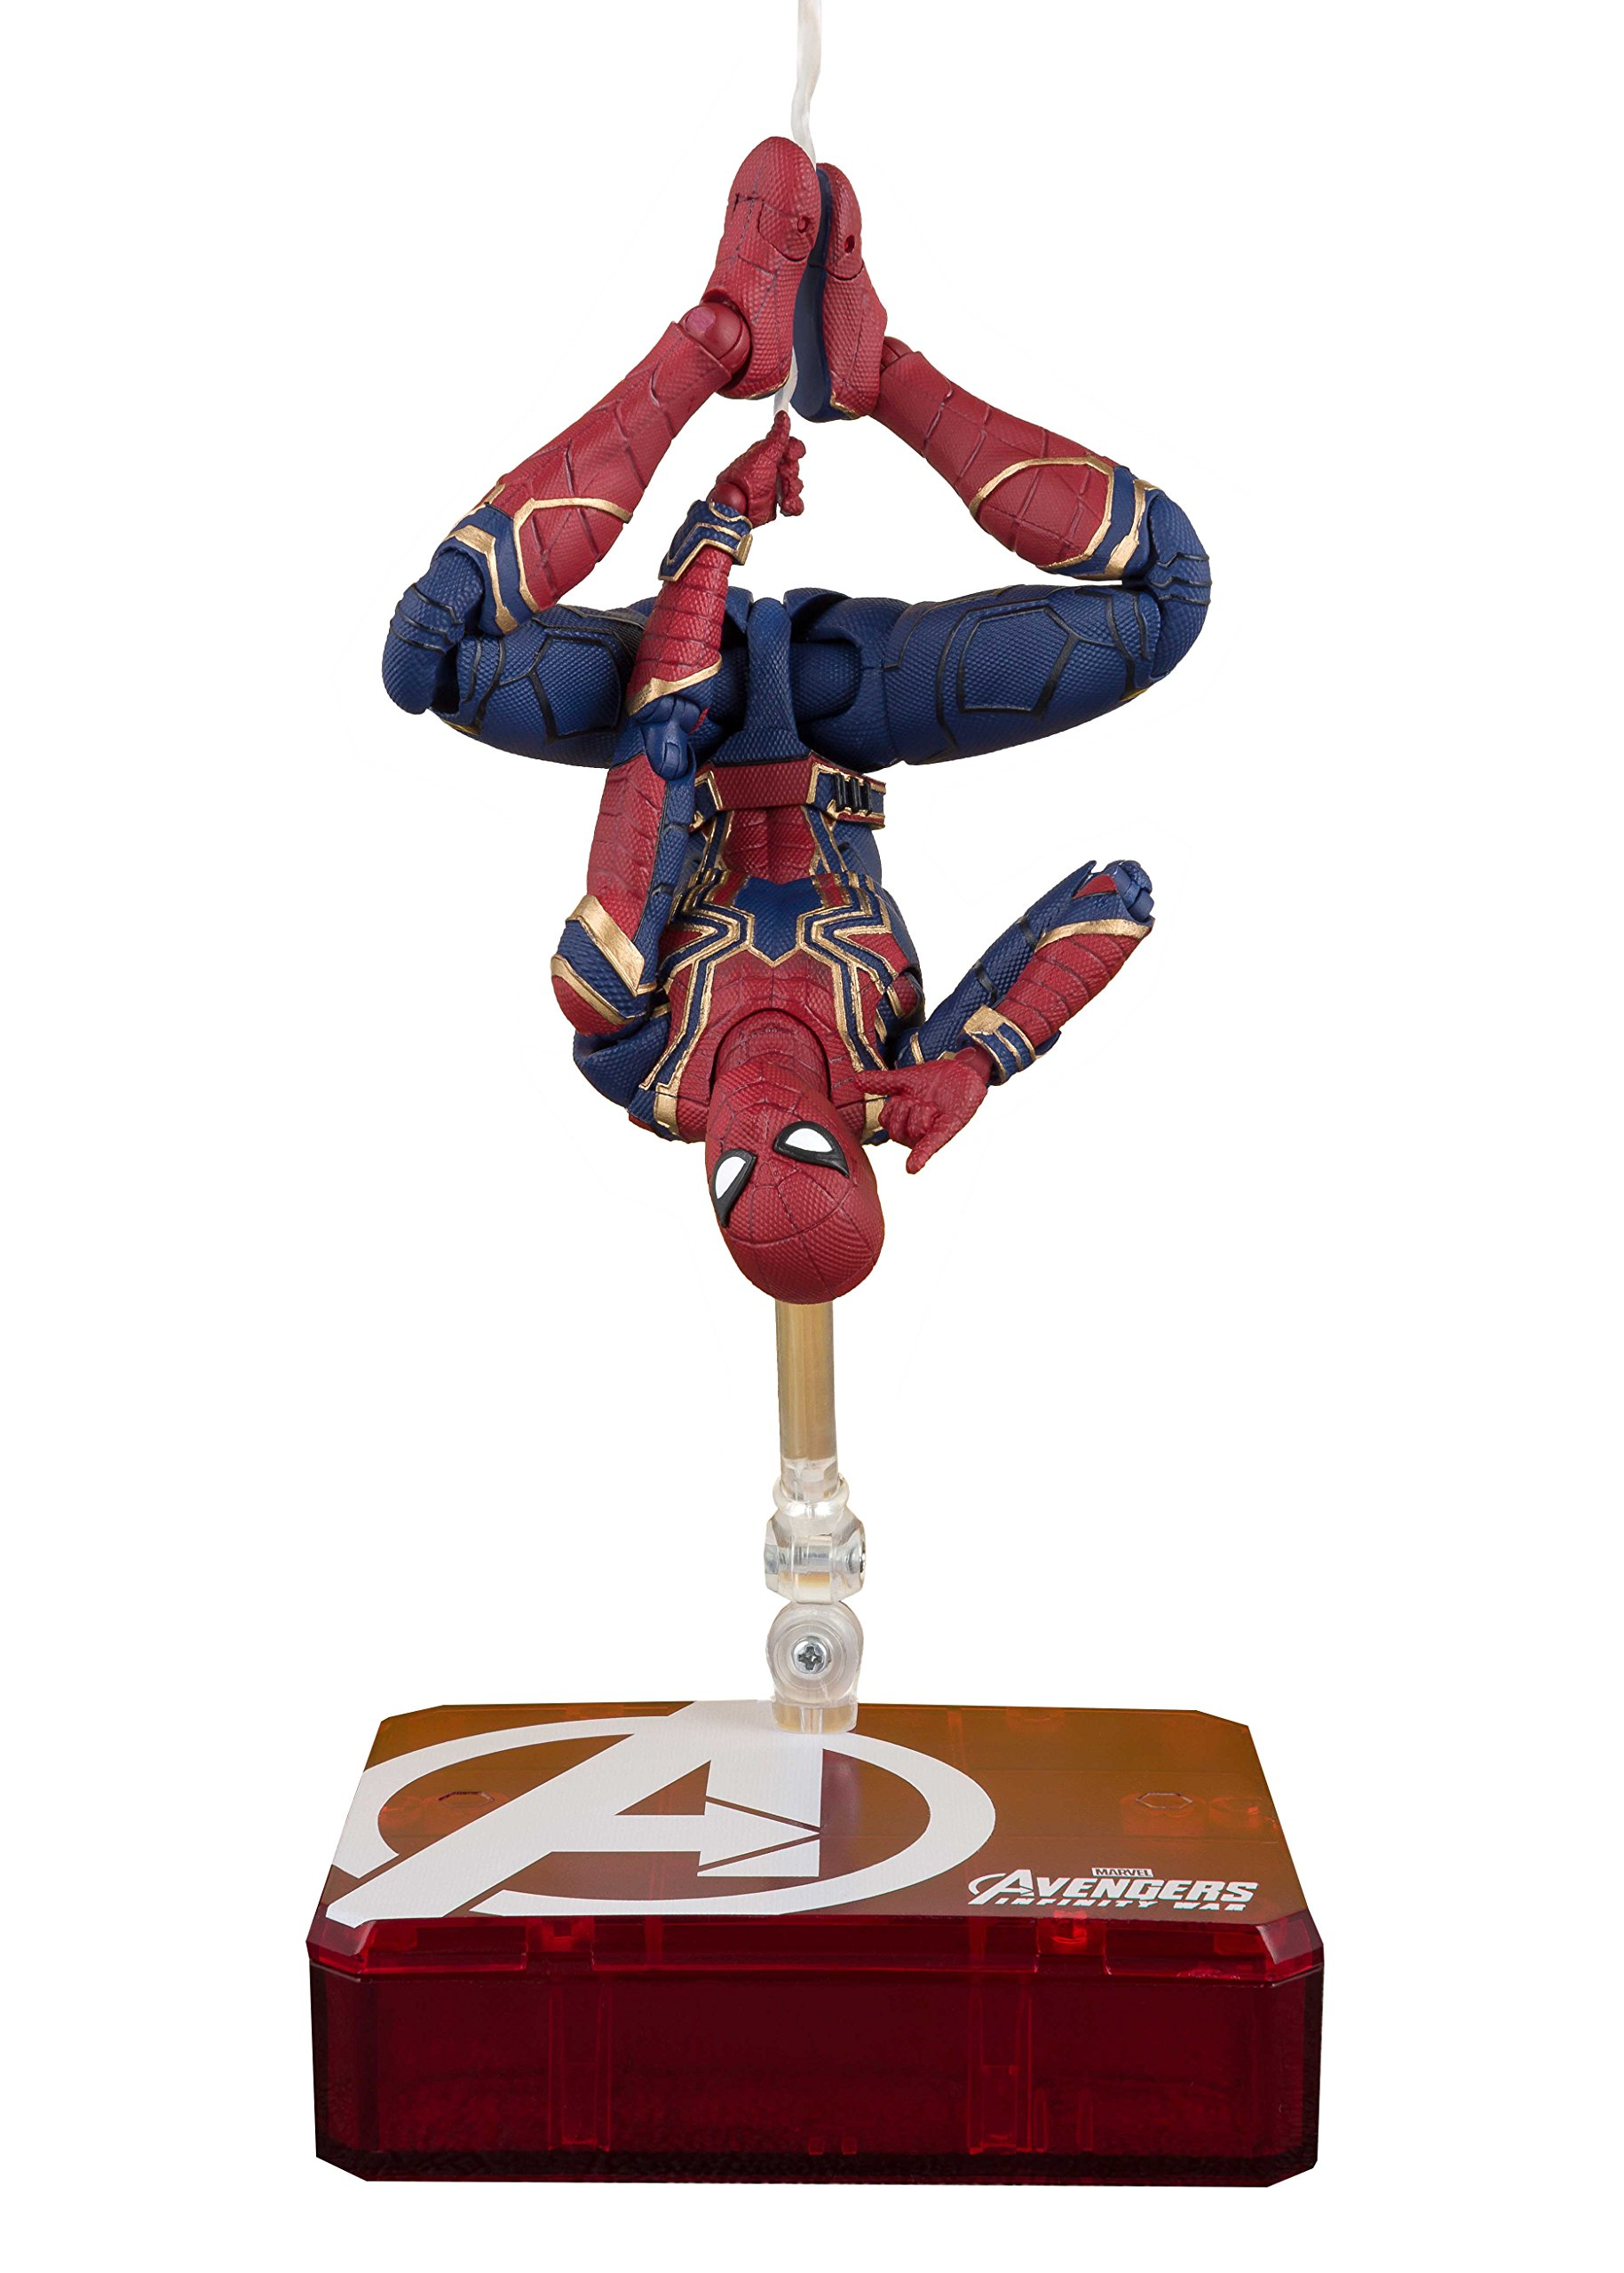 Bandai Tamashii Nations S.H. Figuarts Iron Spider & Tamashii Stage Avengers: Infinity War Action Figure